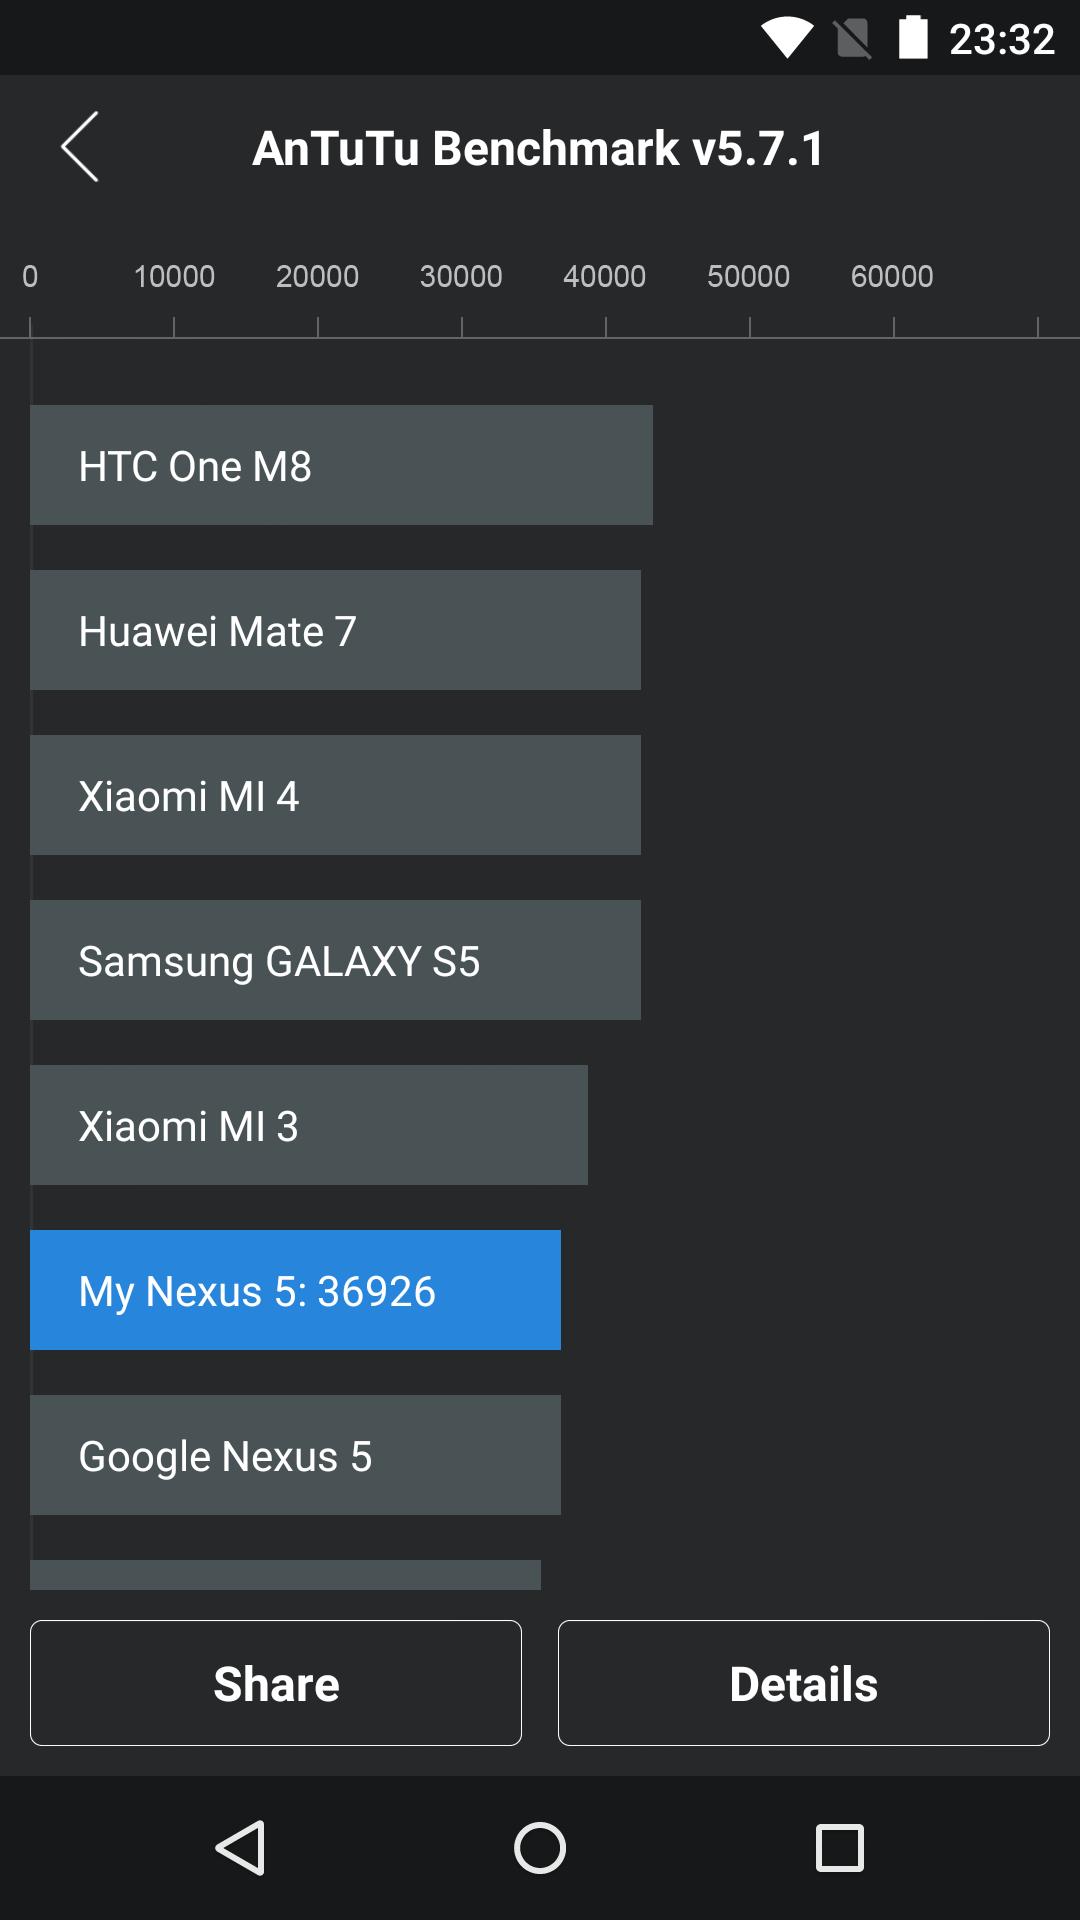 benchmarks nexus 5 android 5 1 1 39 43. Black Bedroom Furniture Sets. Home Design Ideas